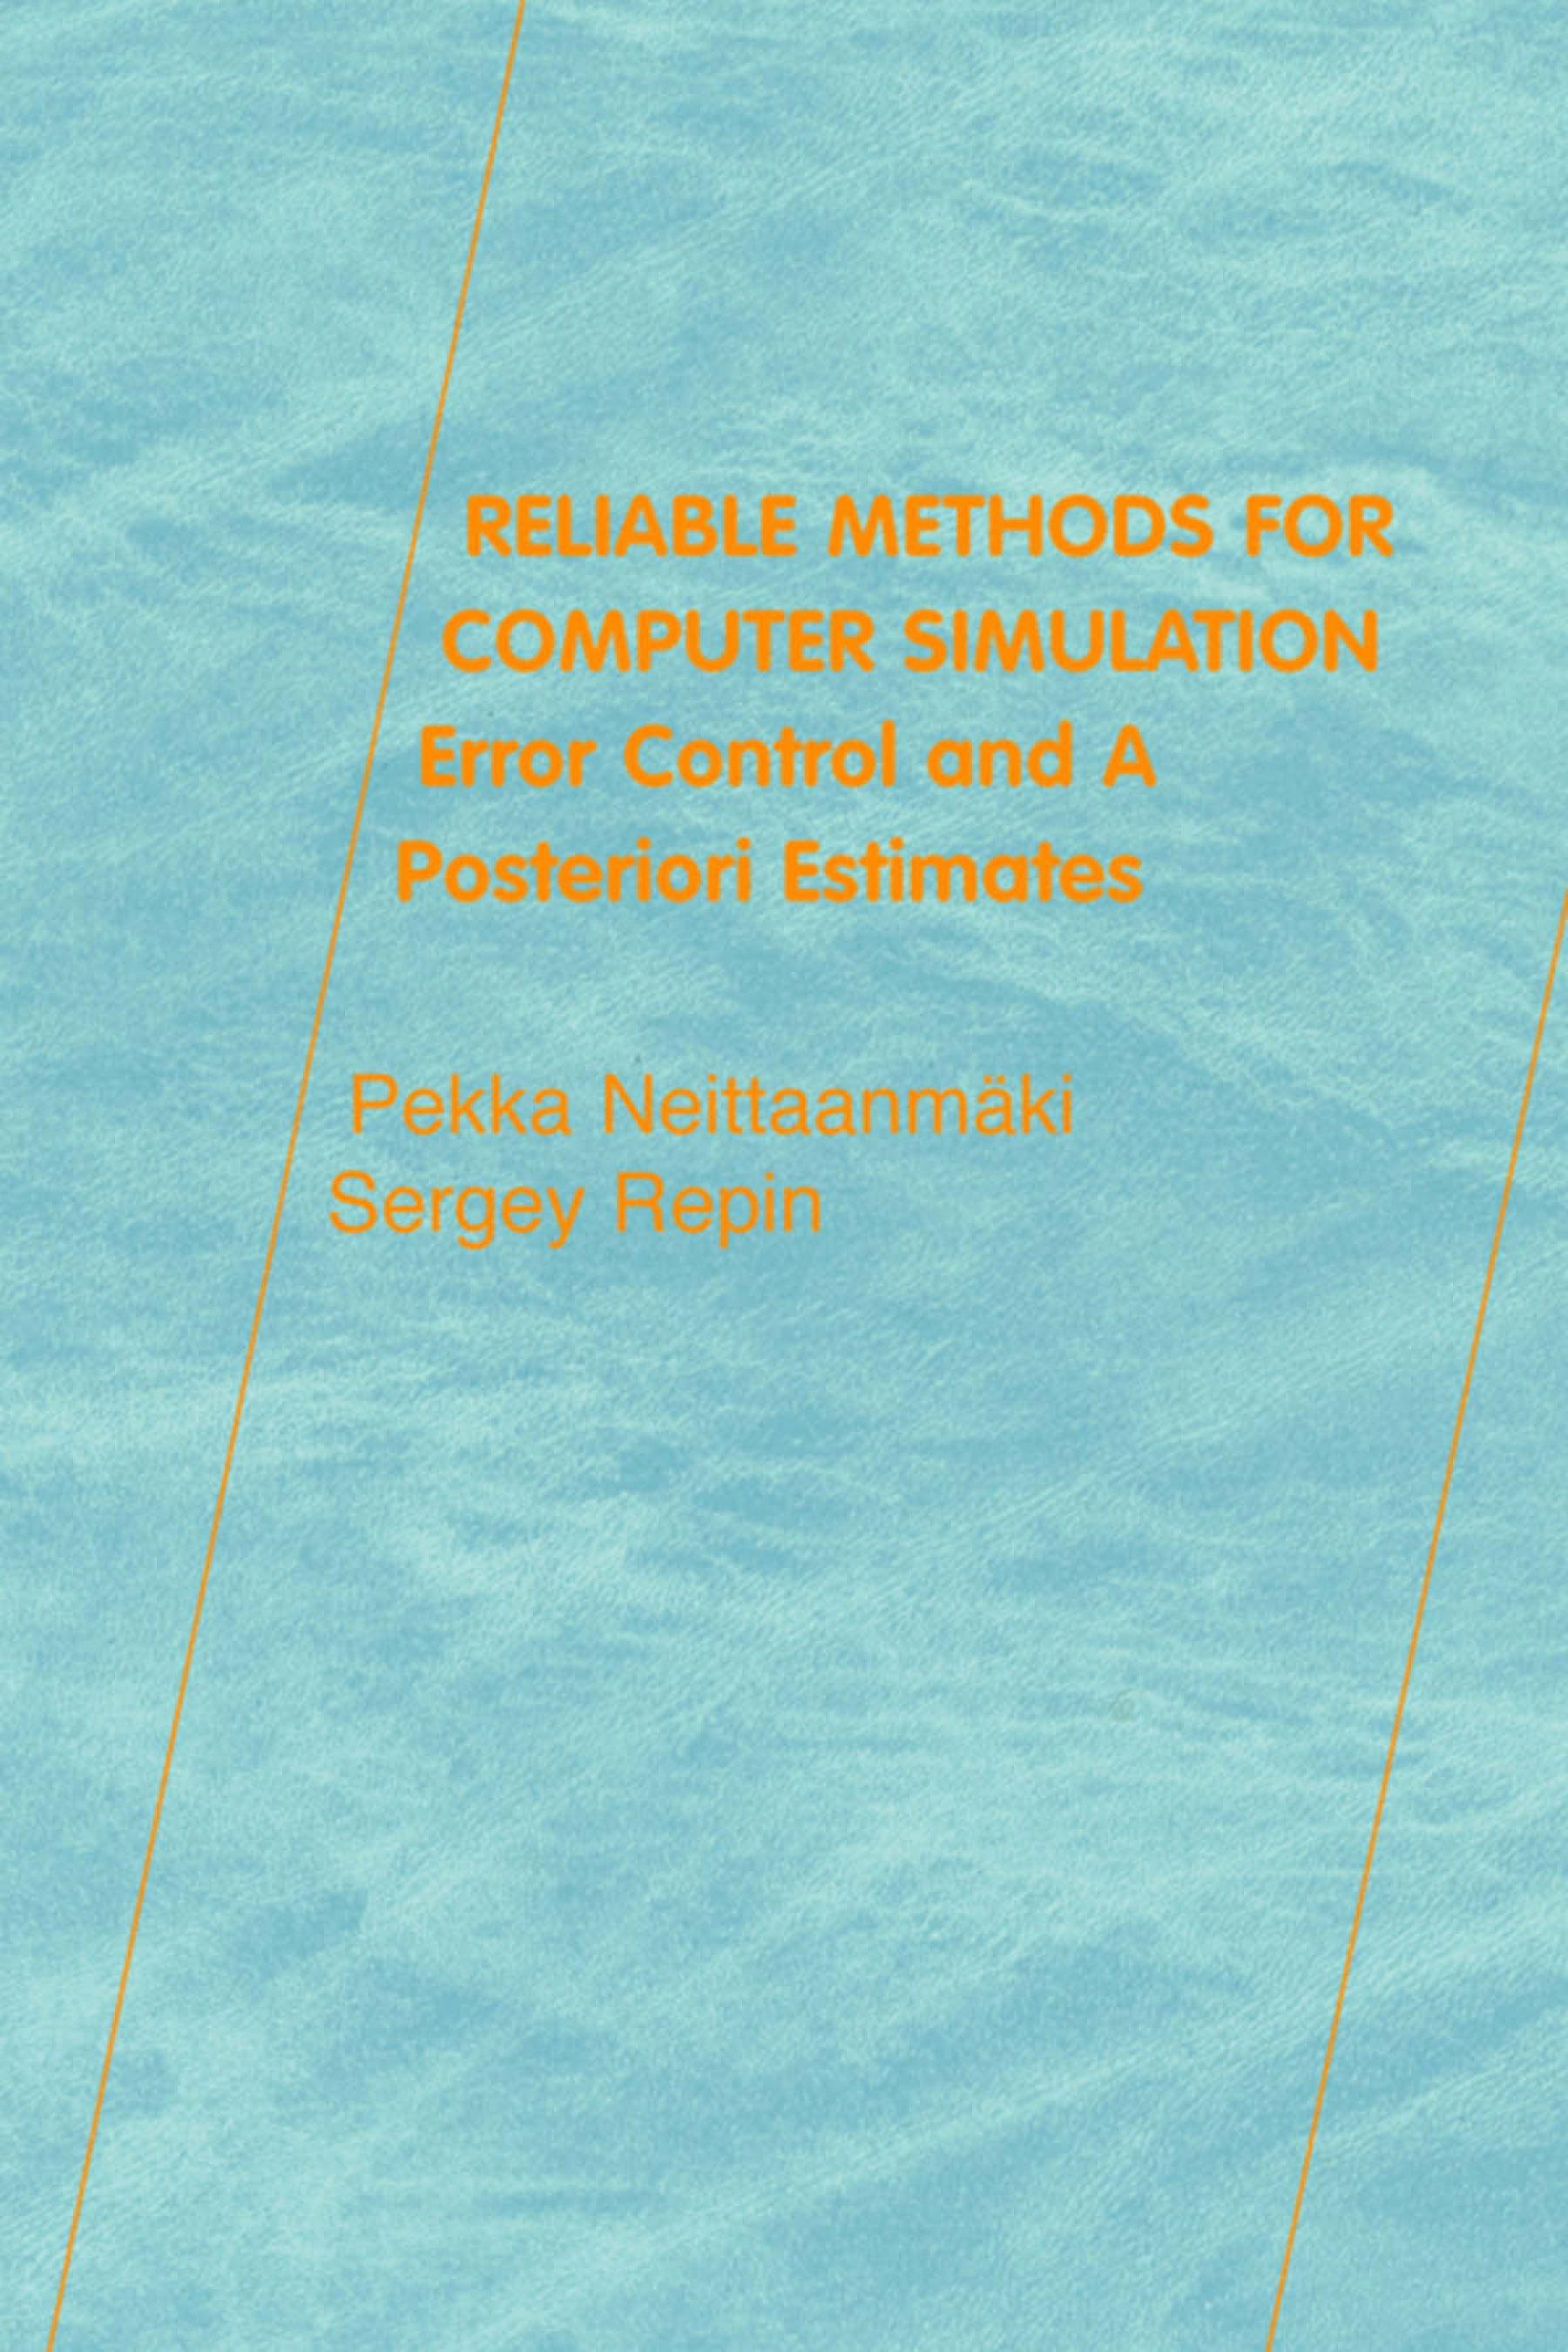 Reliable Methods for Computer Simulation: Error Control and Posteriori Estimates EB9780080540504